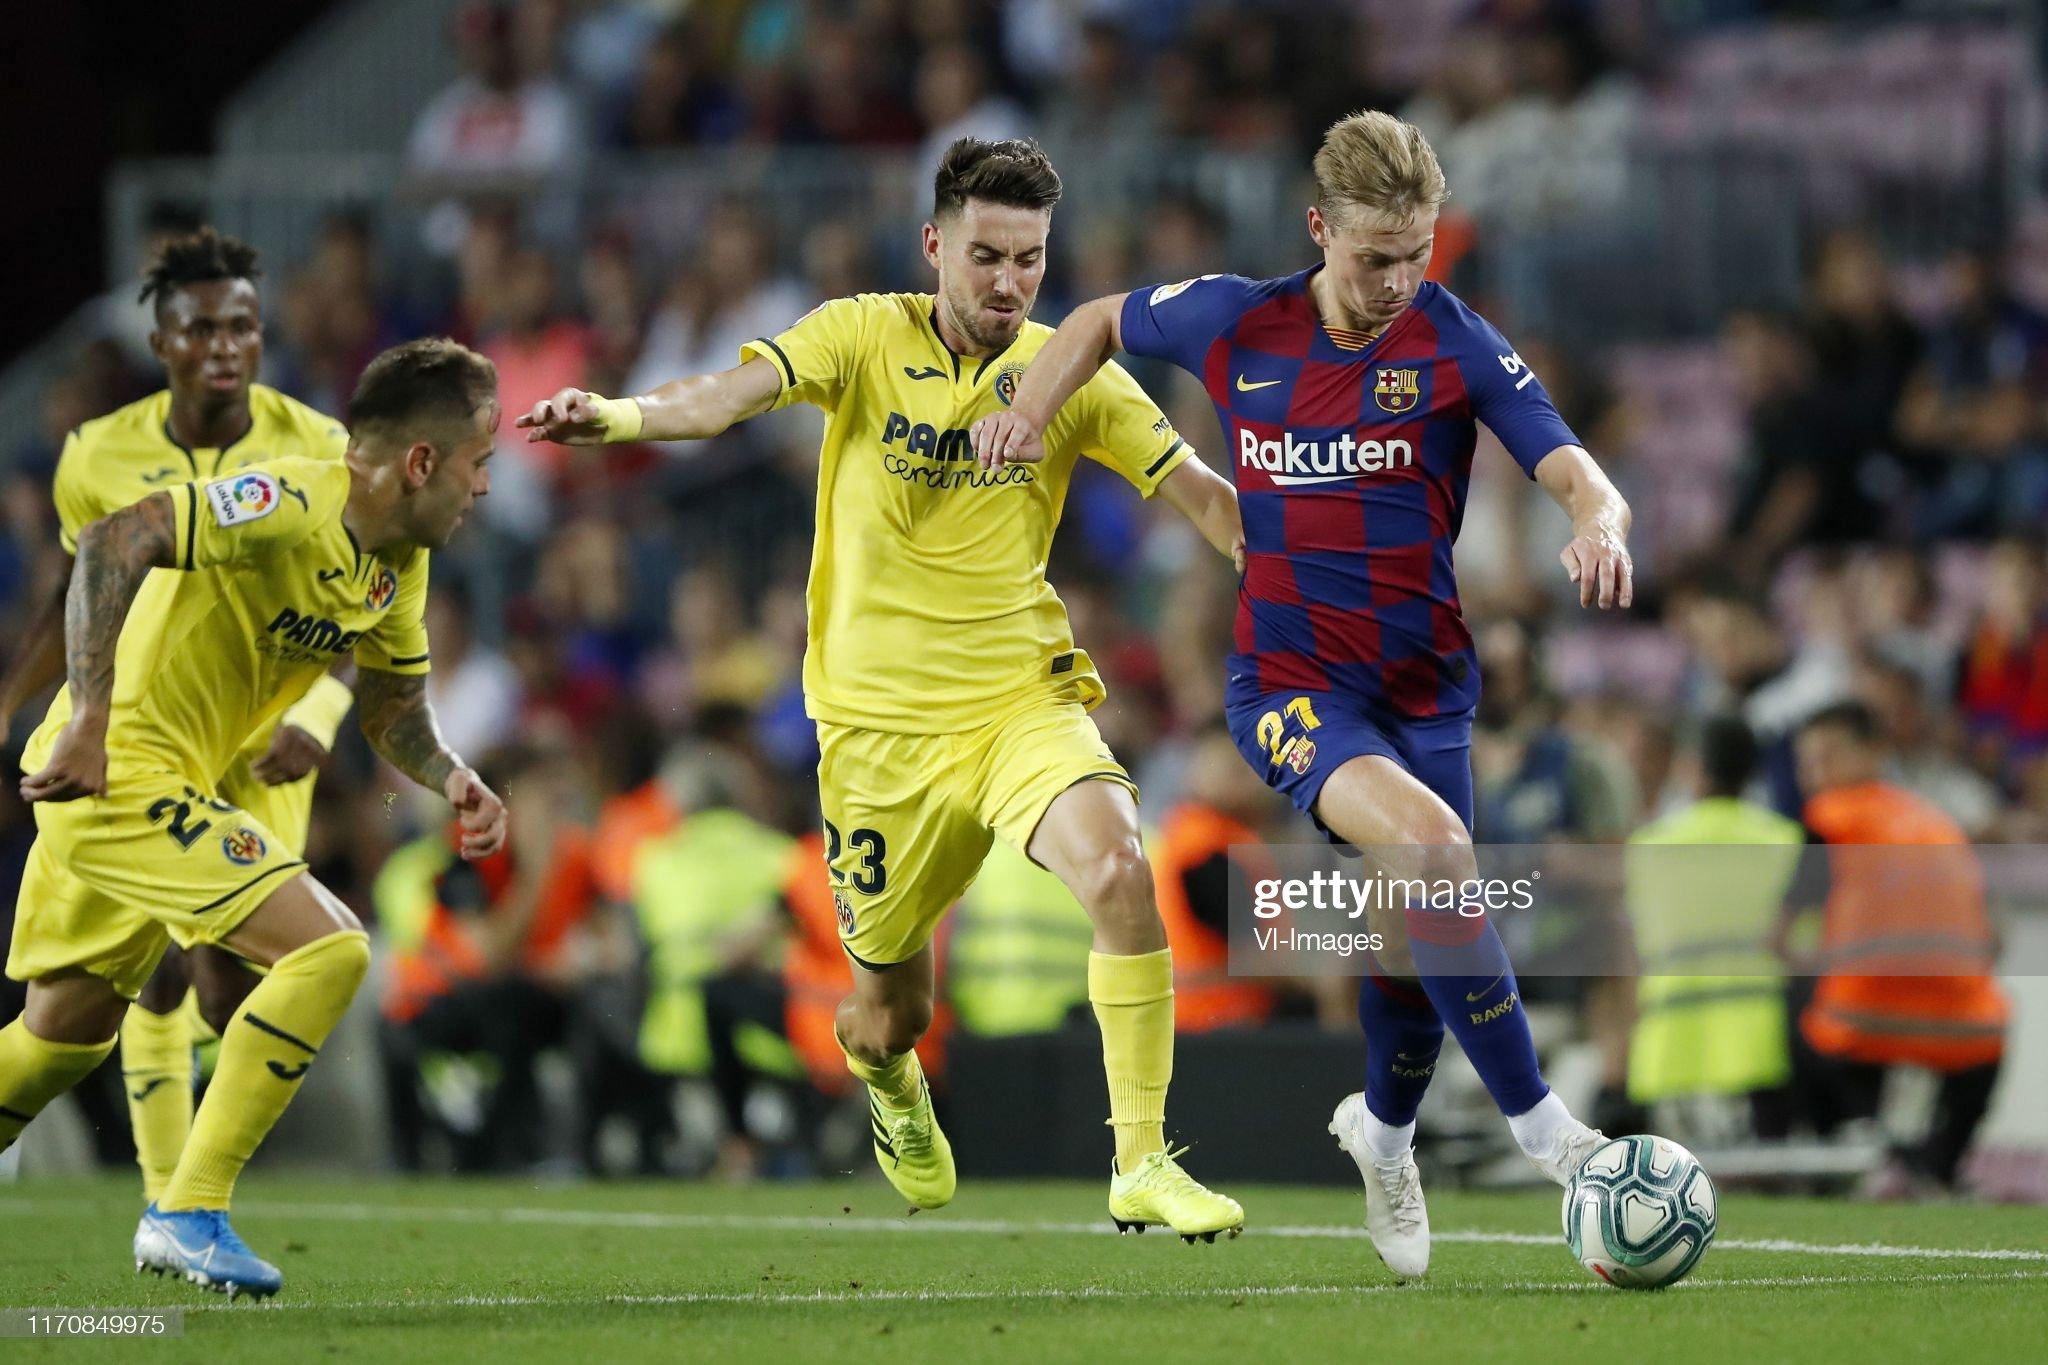 صور مباراة : برشلونة - فياريال 2-1 ( 24-09-2019 )  Ruben-pena-of-villarreal-cf-moi-gomez-of-villarreal-cf-frenkie-de-of-picture-id1170849975?s=2048x2048